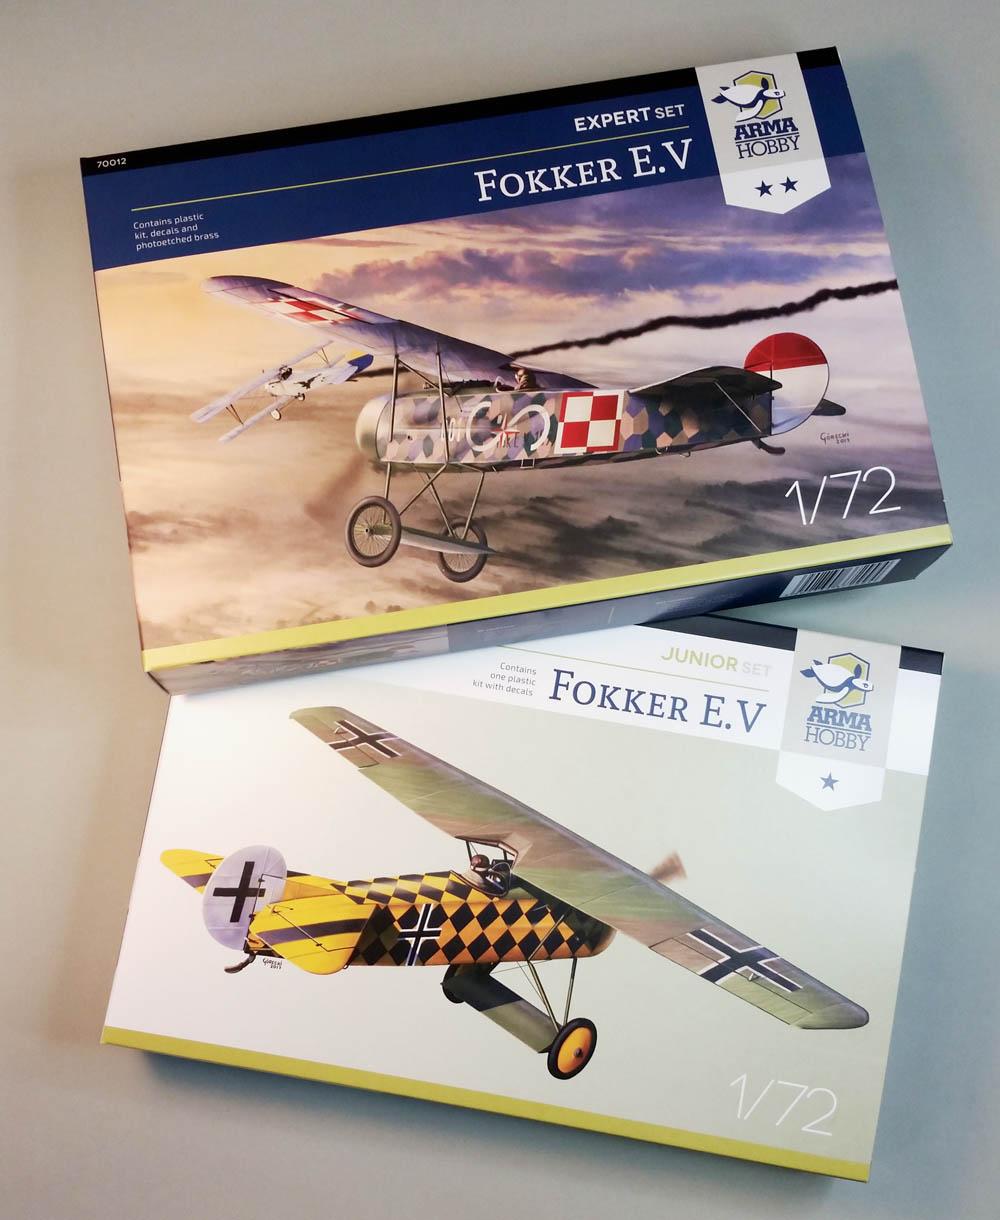 Modele Fokker E.V – co jest w pudełku – inbox